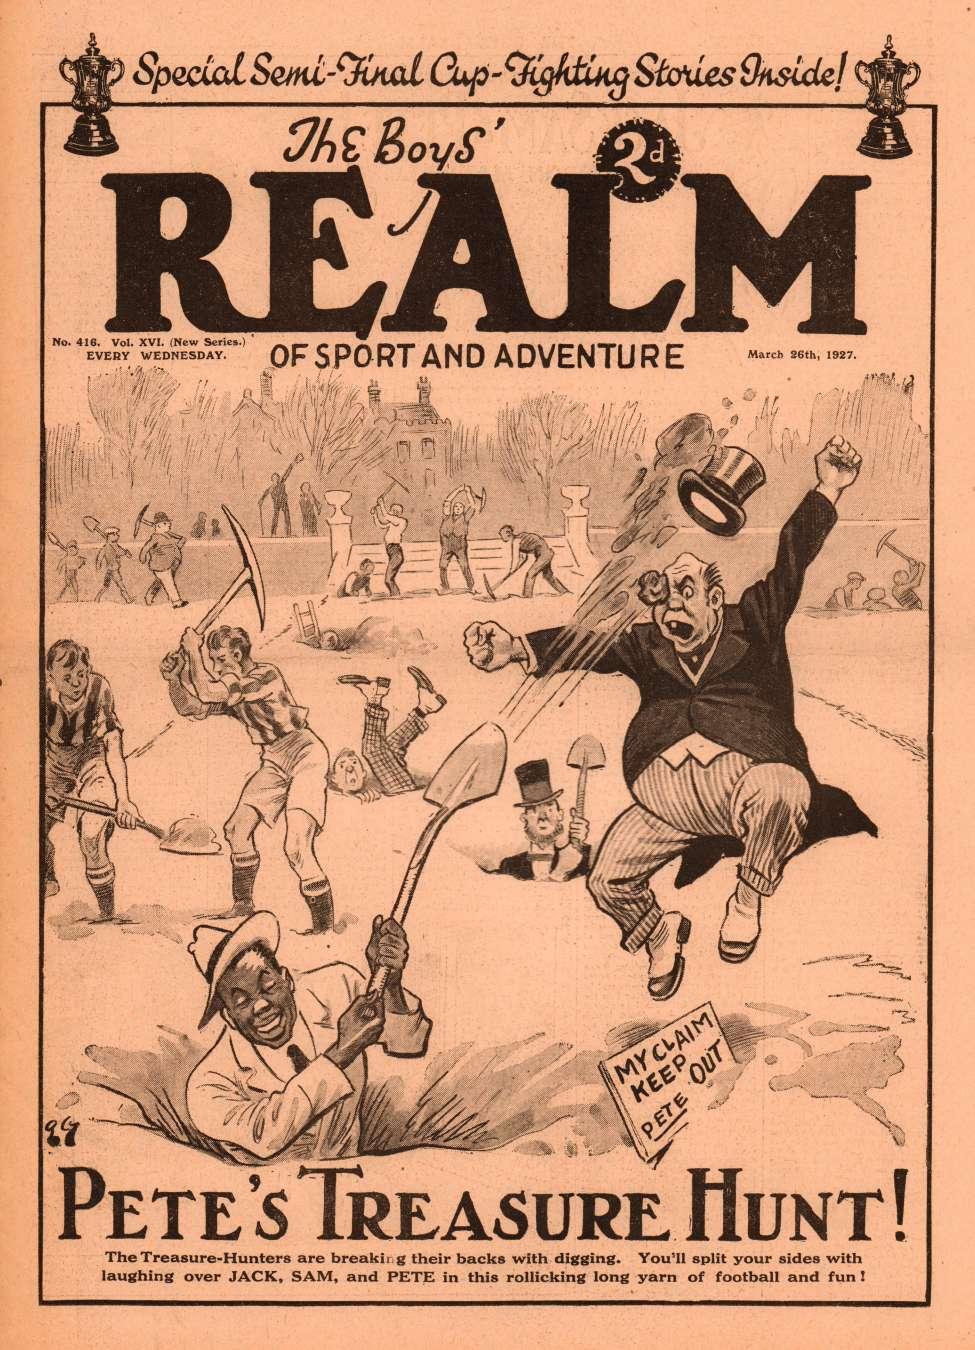 Comic Book Cover For The Boys' Realm v2 416 - Pete's Treasure Hunt!